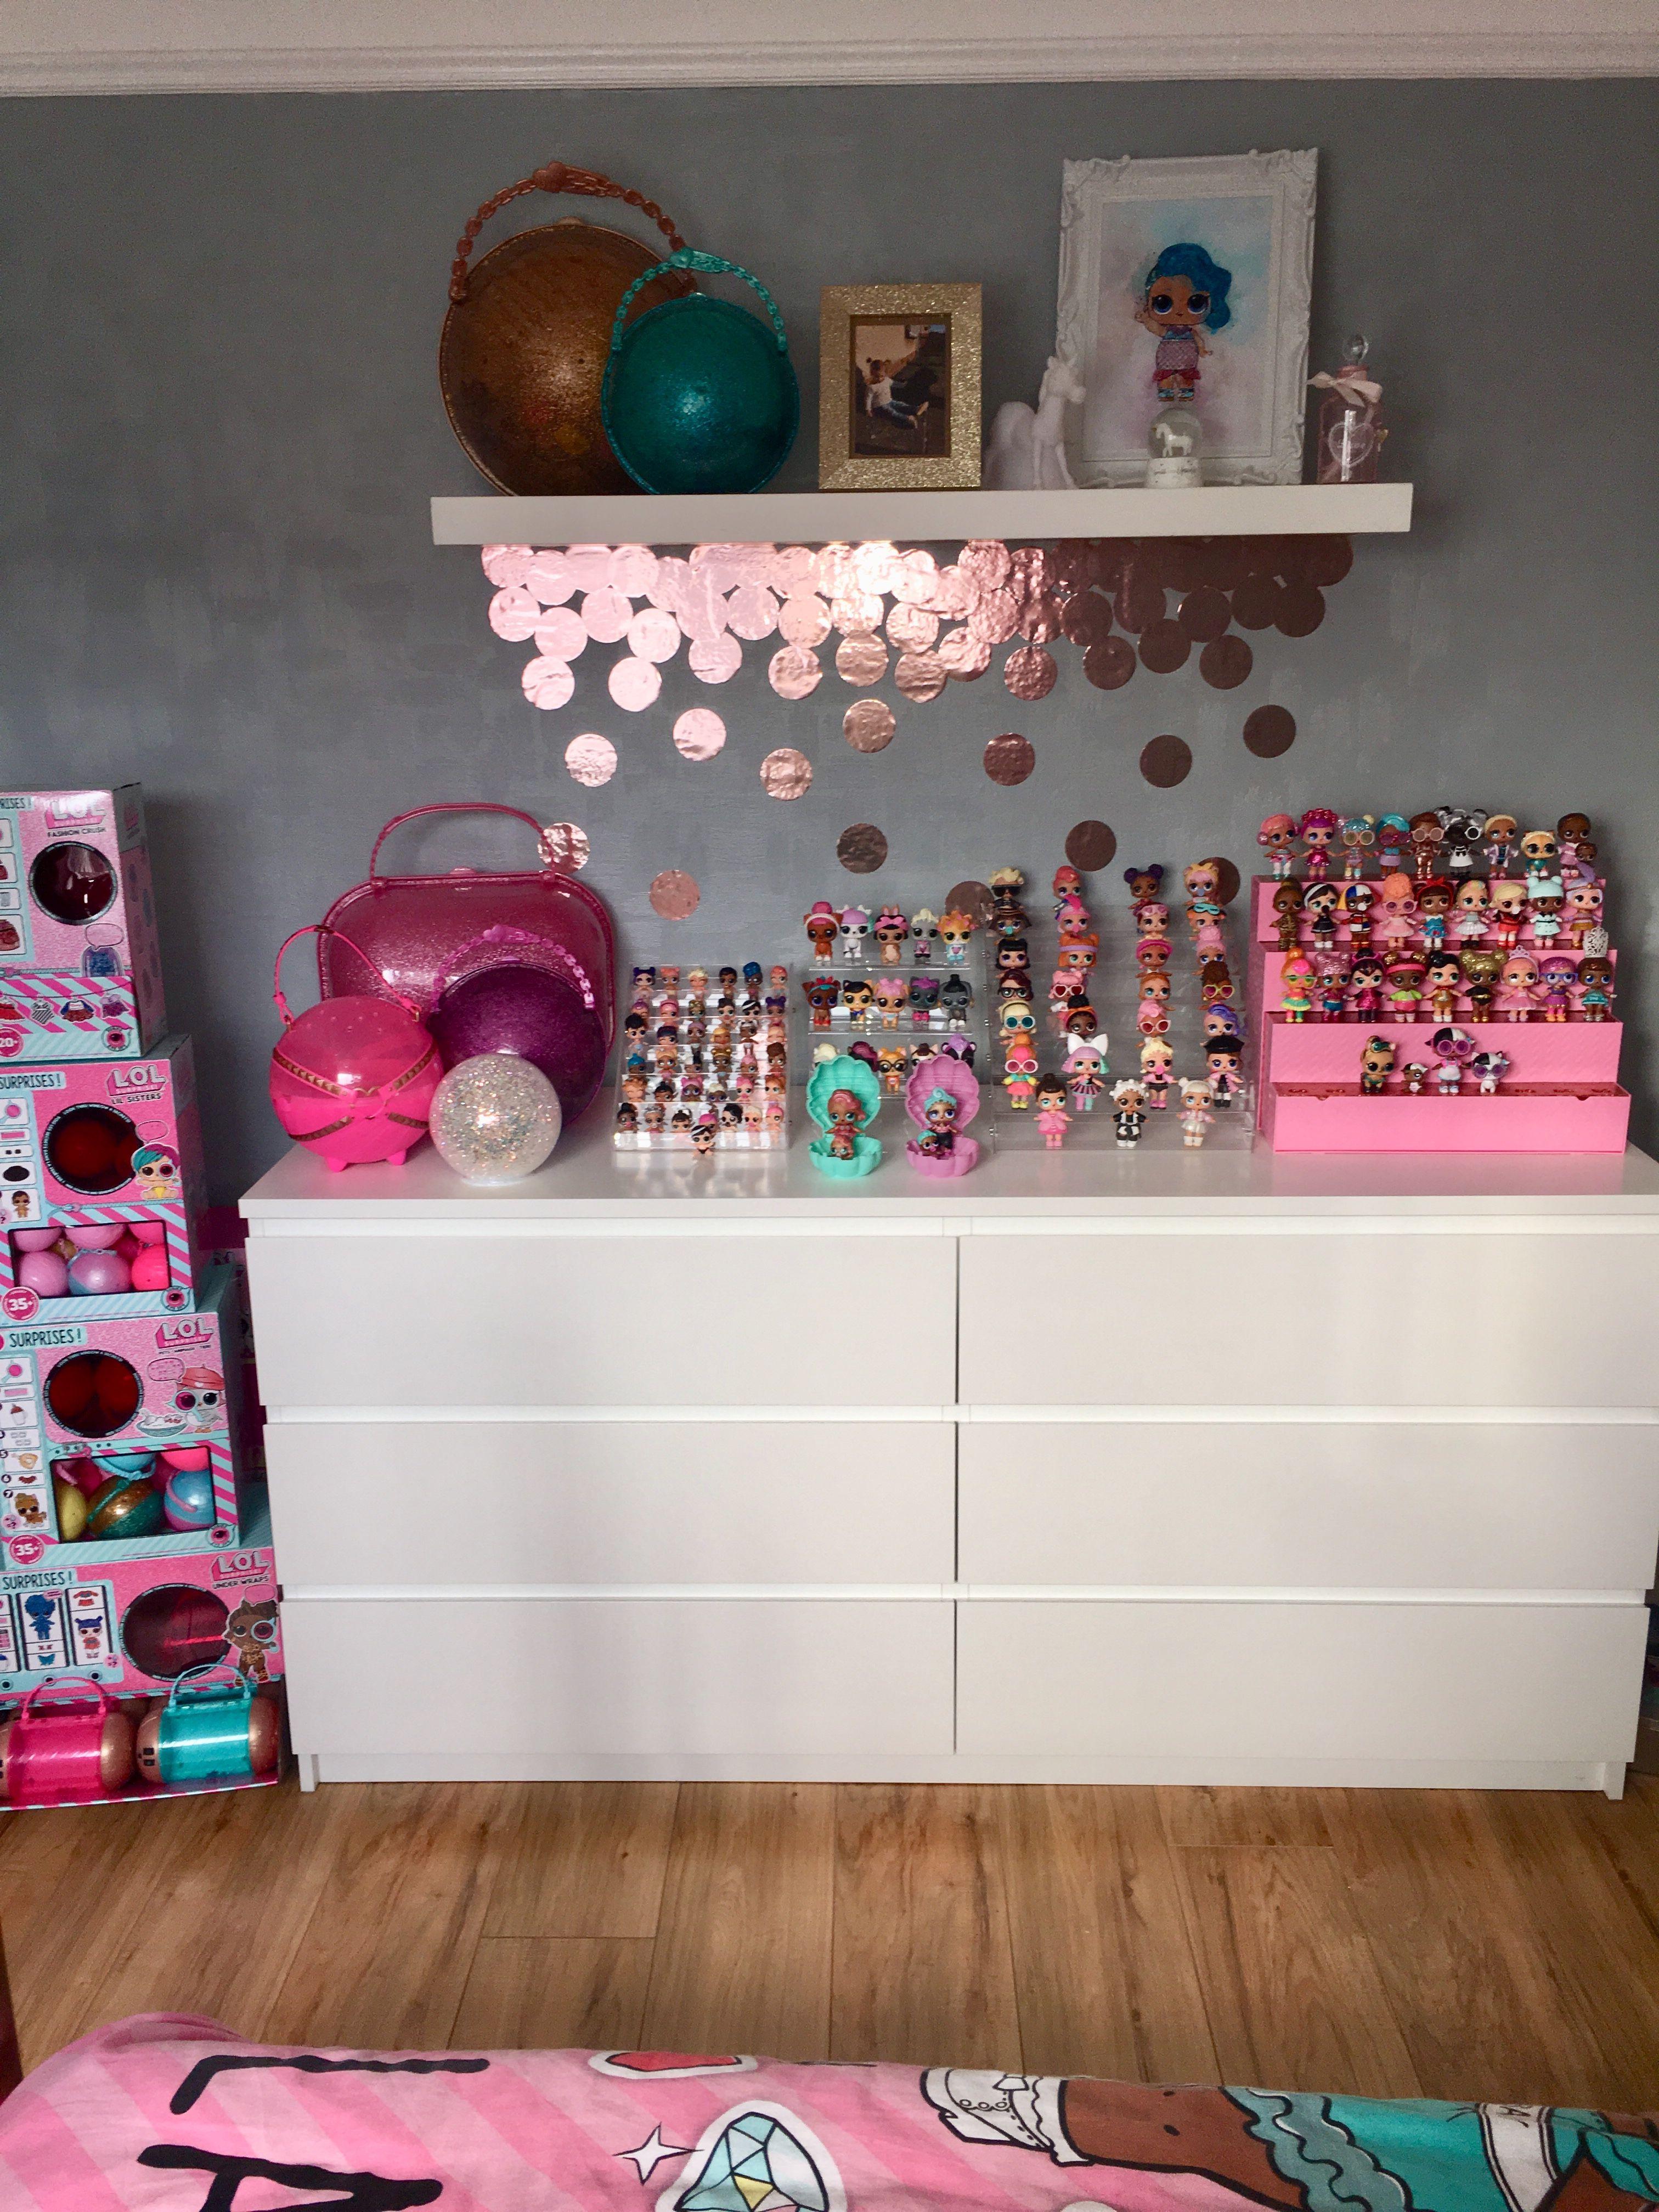 My Little Girls Lol Inspired Bedroom Girlsbedroom Lol Lolsurprise Lolsurprisedolls Loldol Diy Girls Bedroom Lol Surprise Bedroom Ideas Girls Room Decor